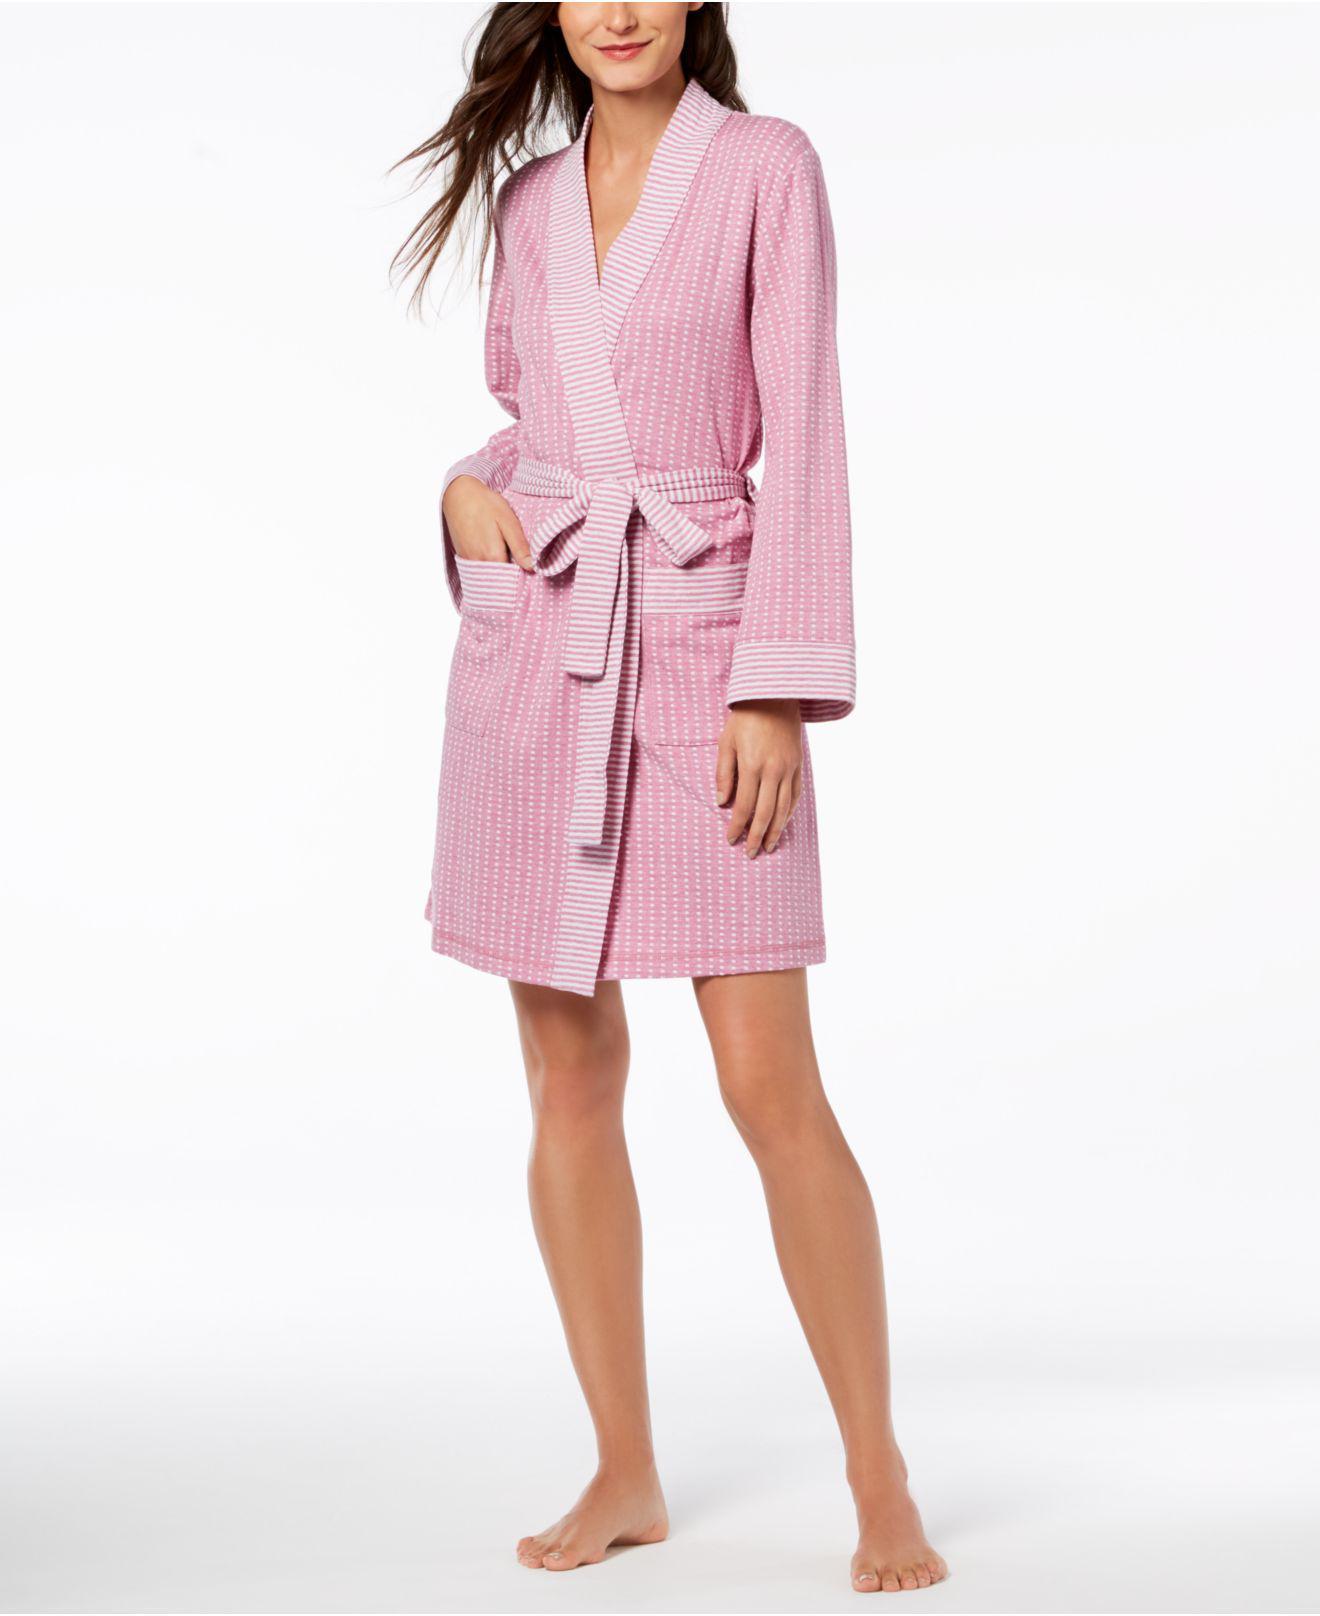 ae6f3a401e Lyst - Charter Club Knit Robe